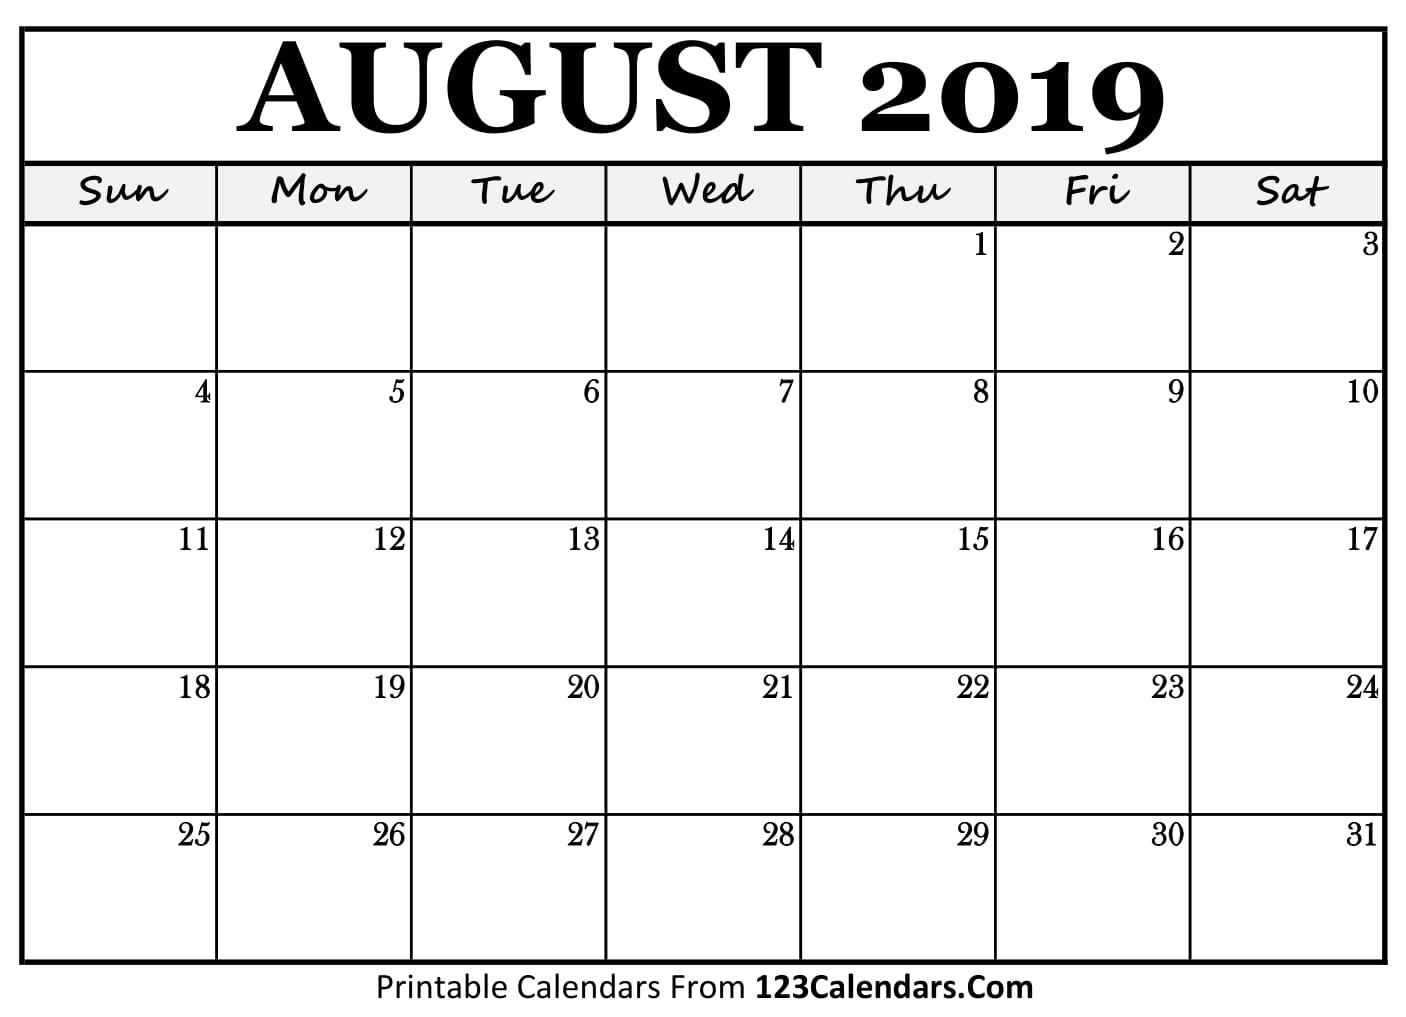 Blank August 2019 Calendar To Print